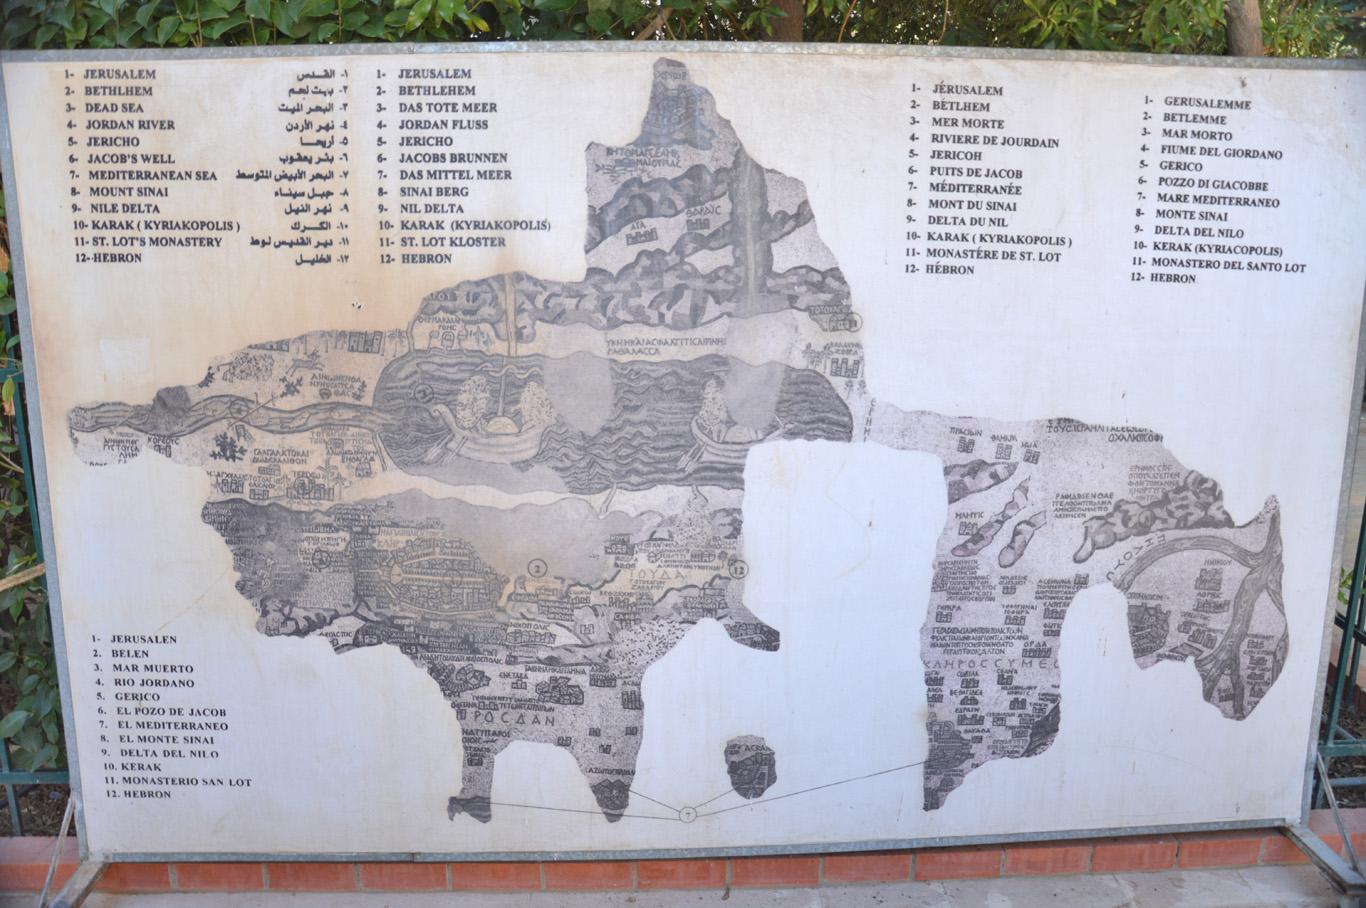 Mosaic - reconstruction